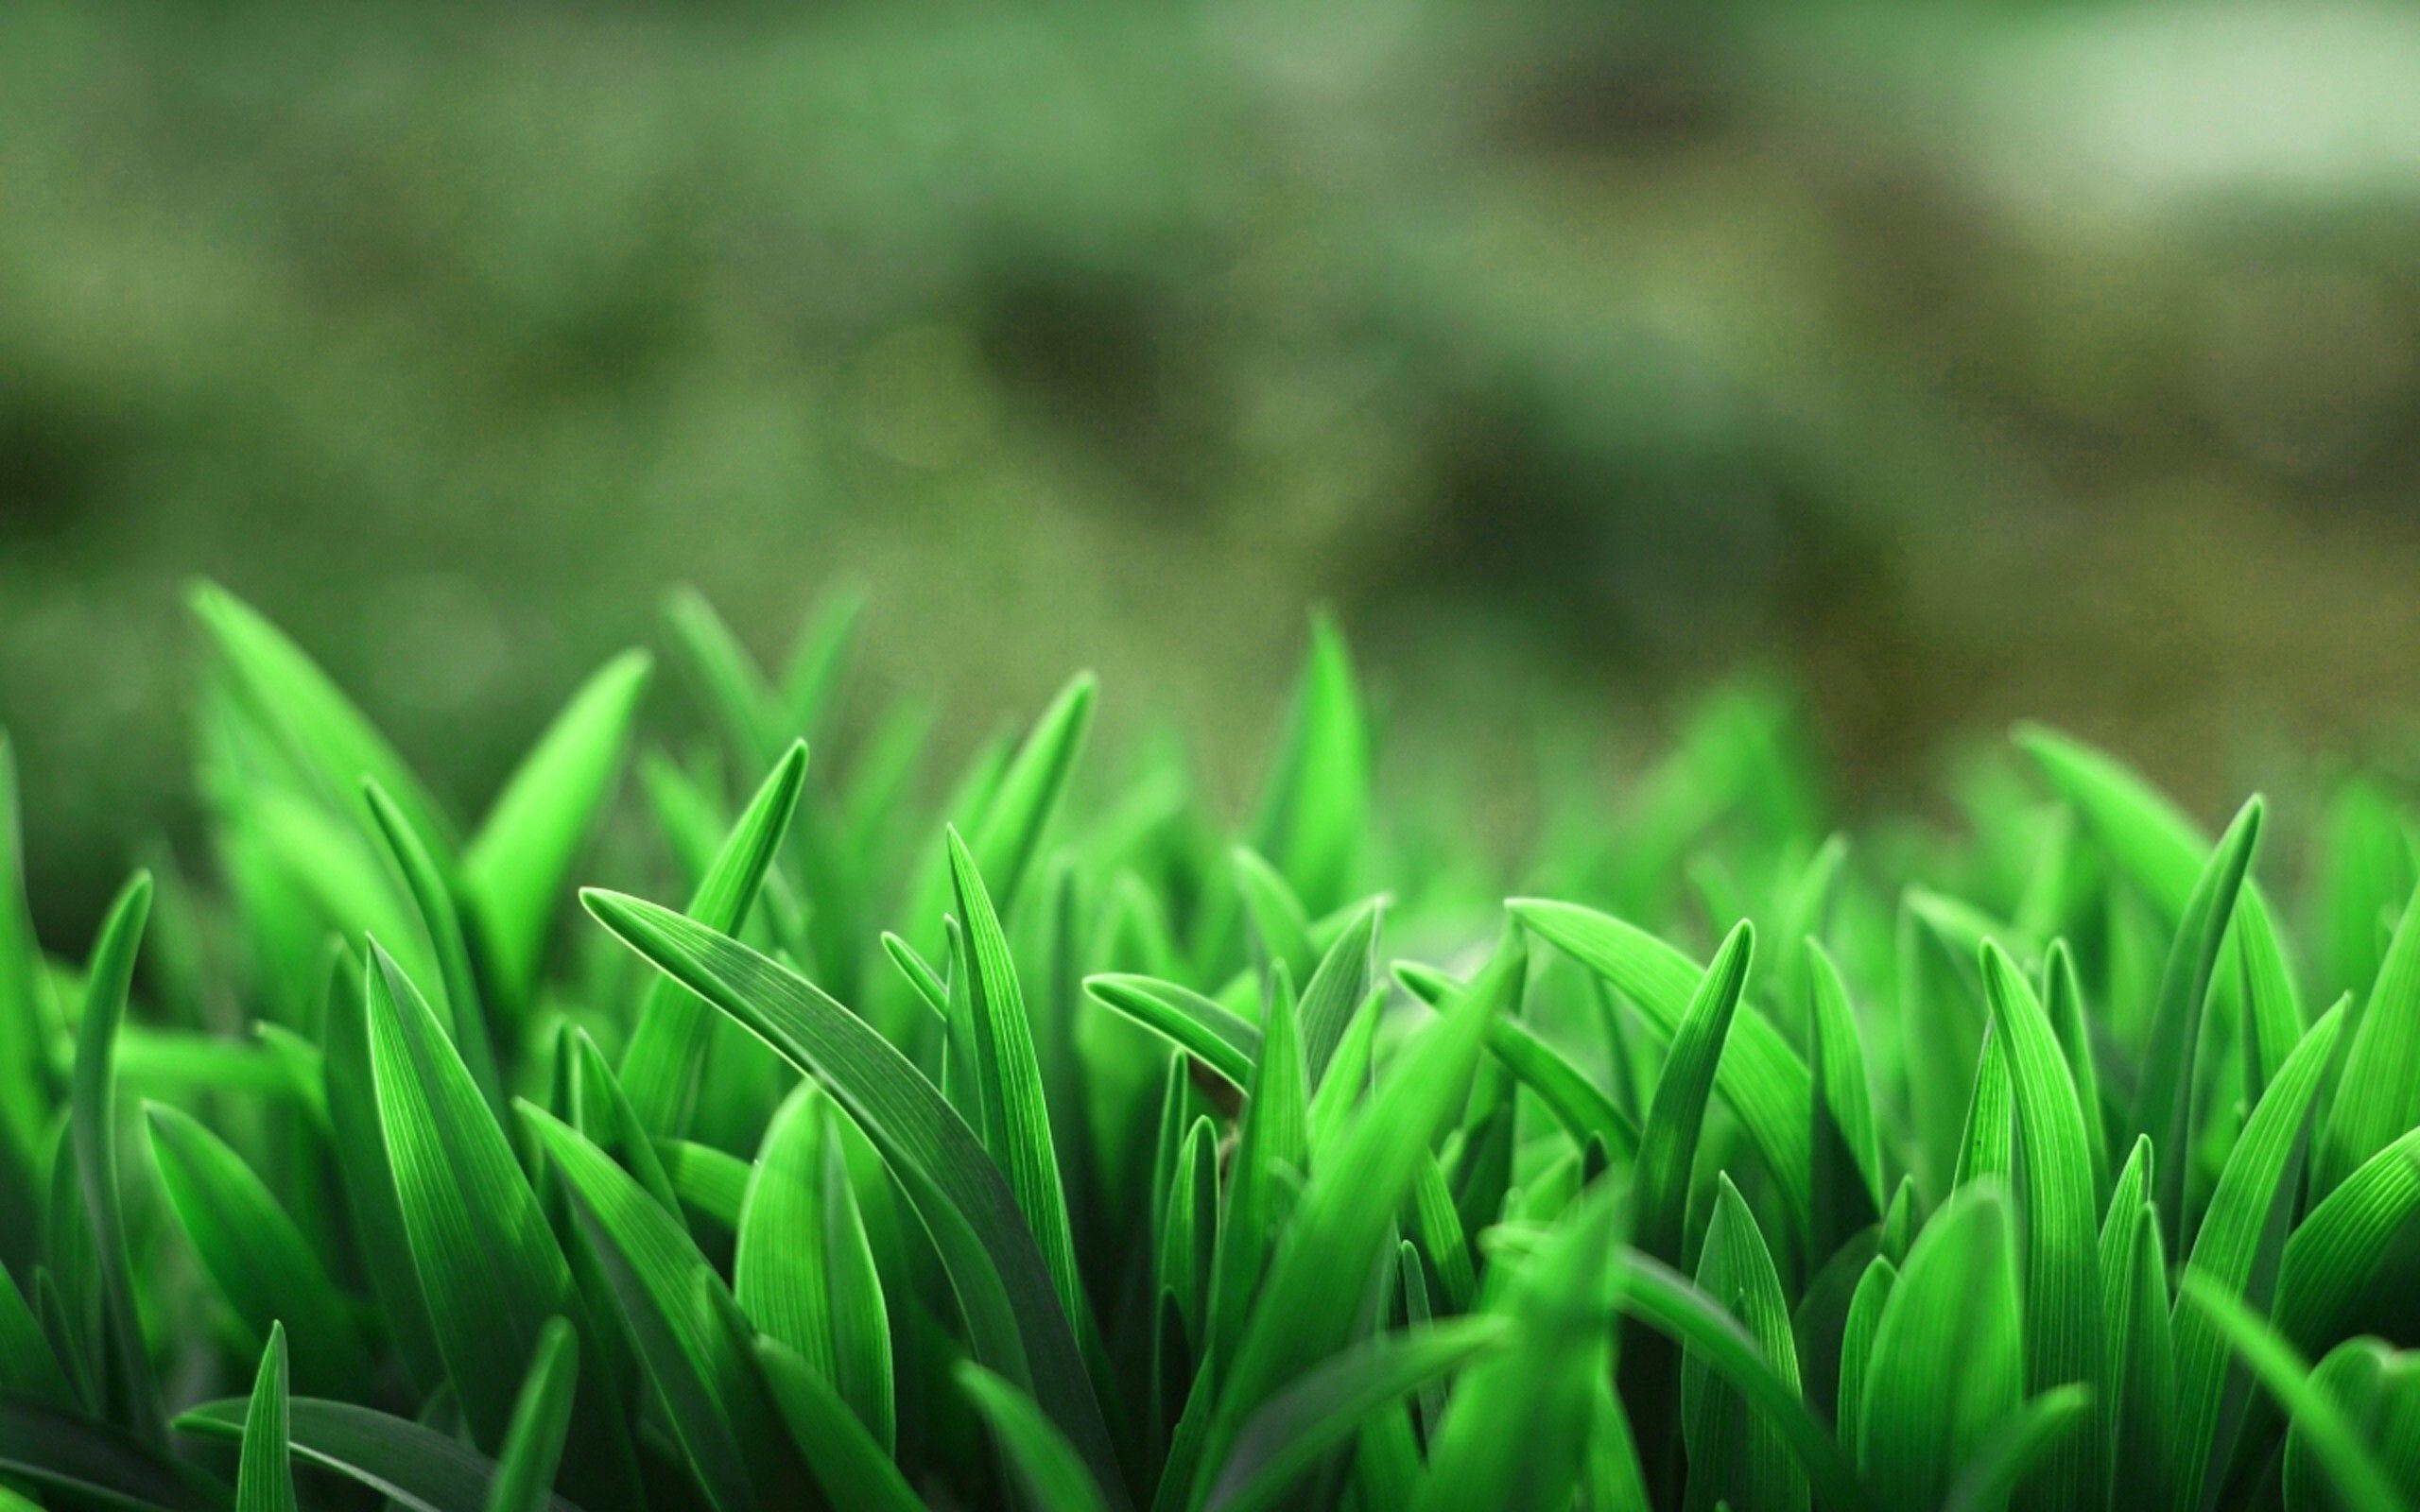 #macro, #blurred, #nature, #plants, #grass, wallpaper ...